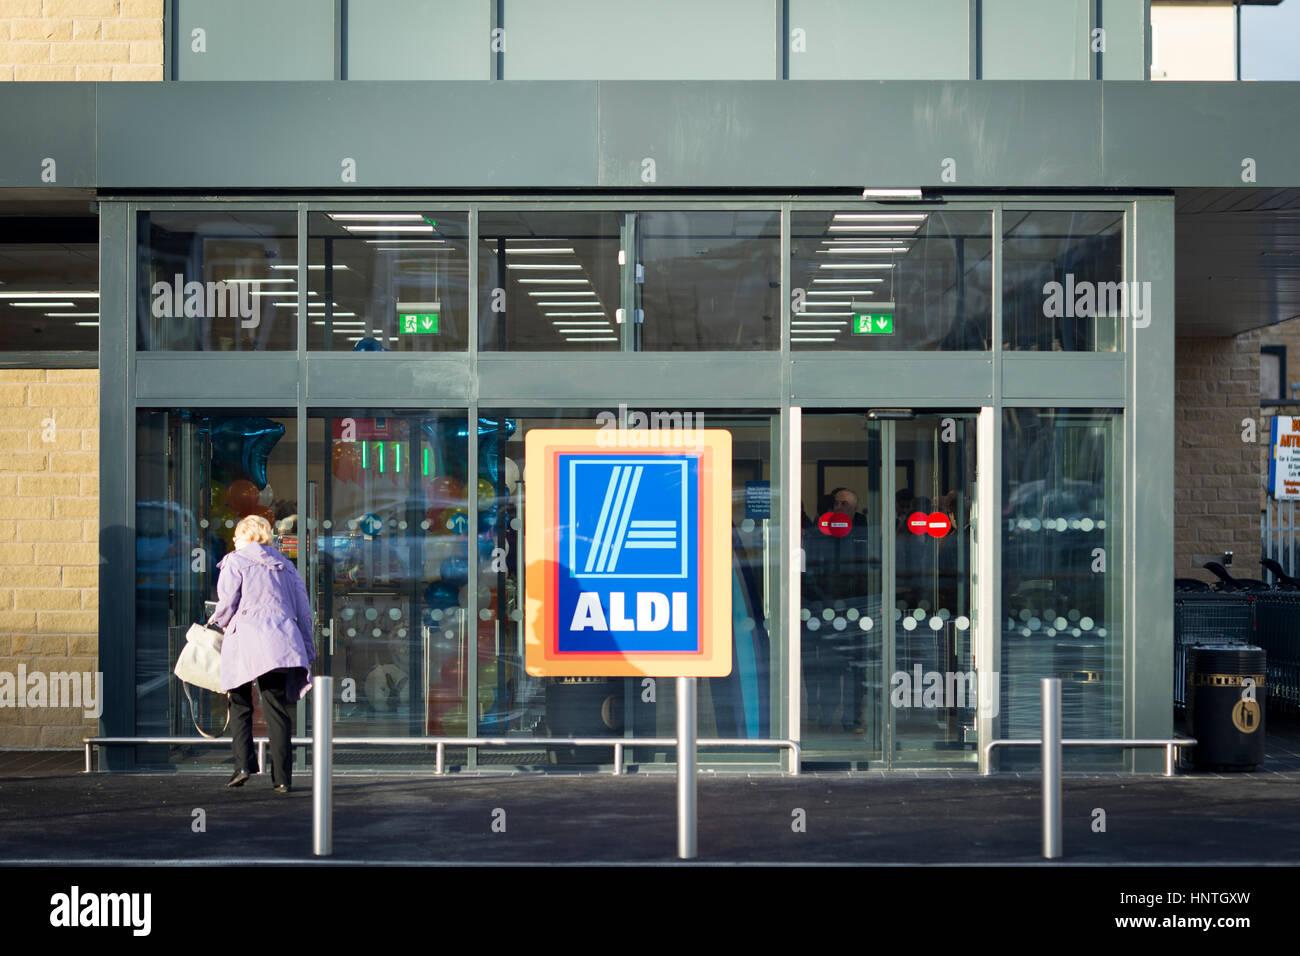 Store Exterior Imágenes De Stock & Store Exterior Fotos De Stock - Alamy